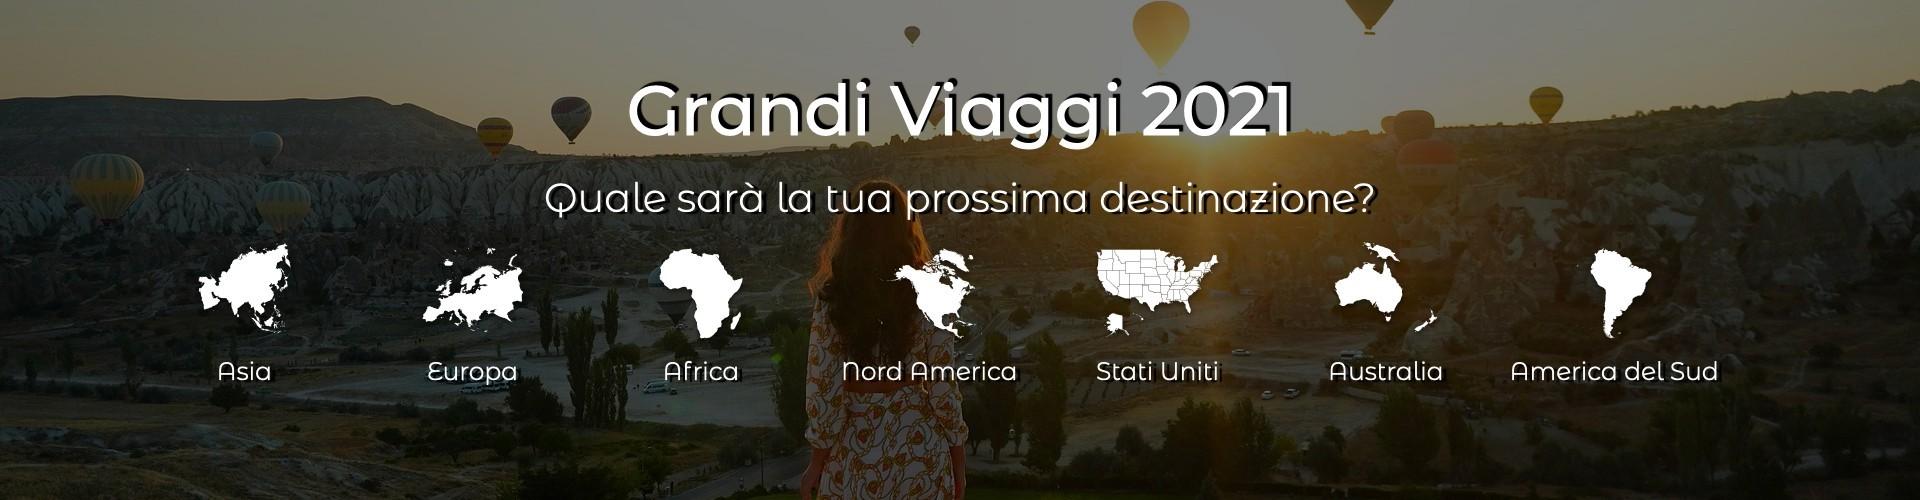 Grandi Viaggi 2021